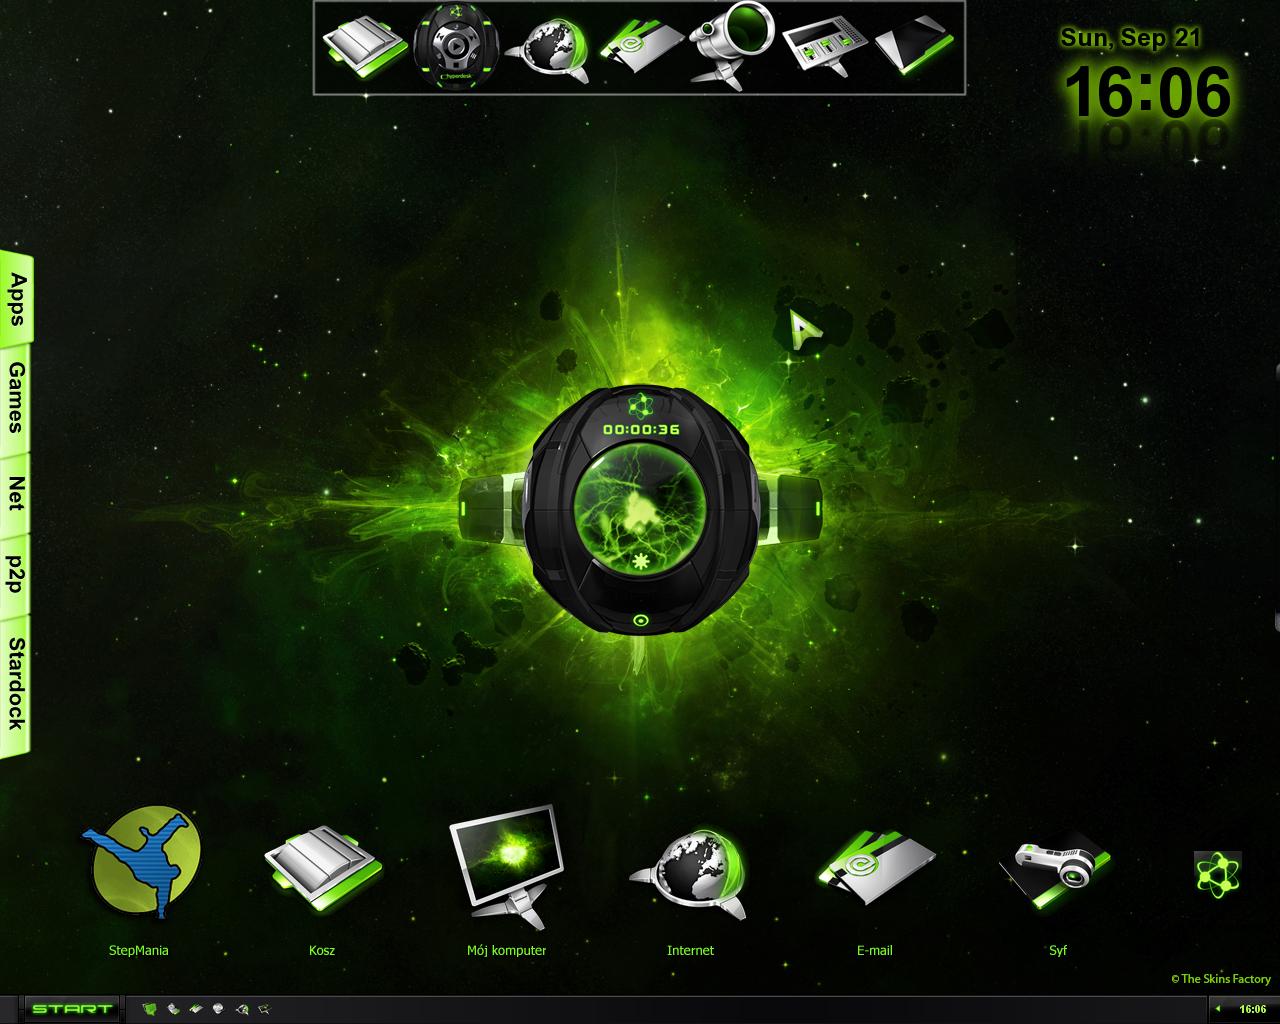 http://fc07.deviantart.net/fs36/f/2008/265/4/6/Desktop_Hyperdesk_Gamma_Ray_by_PiThr0.jpg